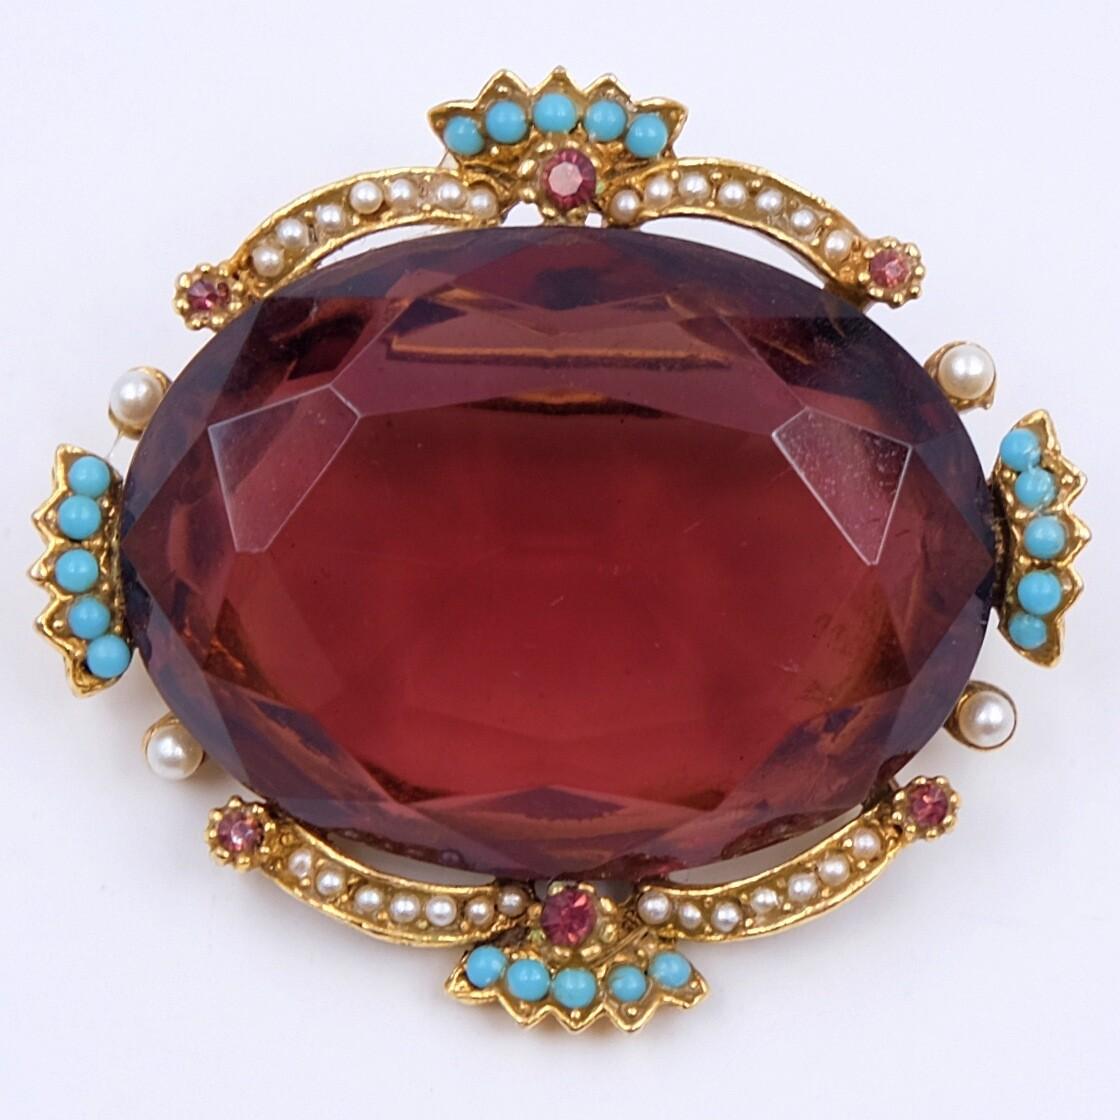 Vintage Art Brooch Purple Glass Victorian Revival 1970s